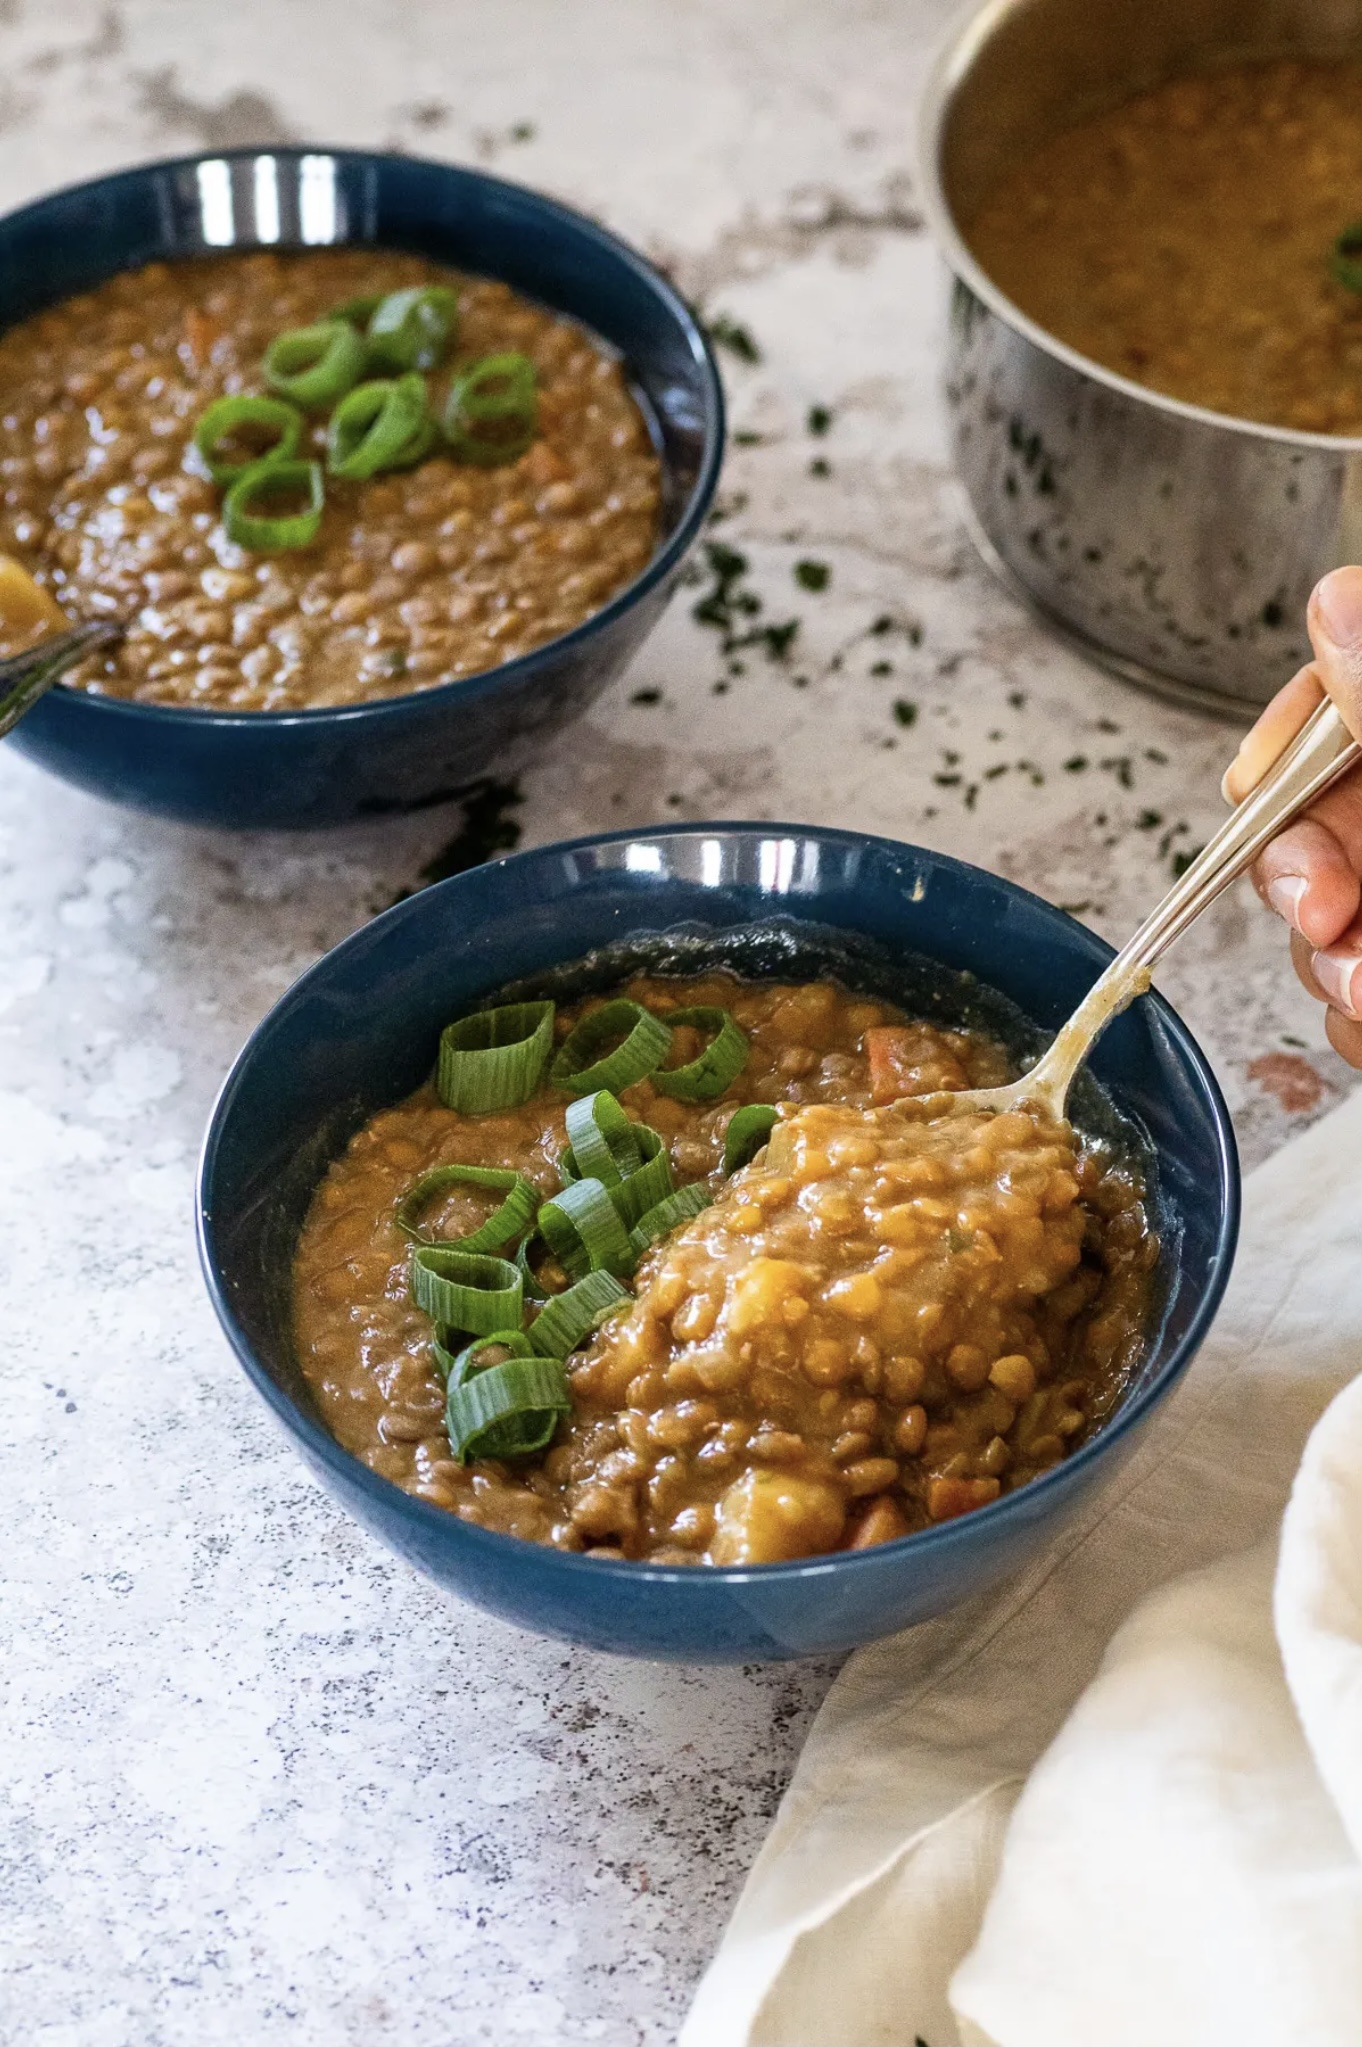 65 Easy Instant Pot + Crockpot Dinner Recipes | Homemade Instant Pot Lentil Soup